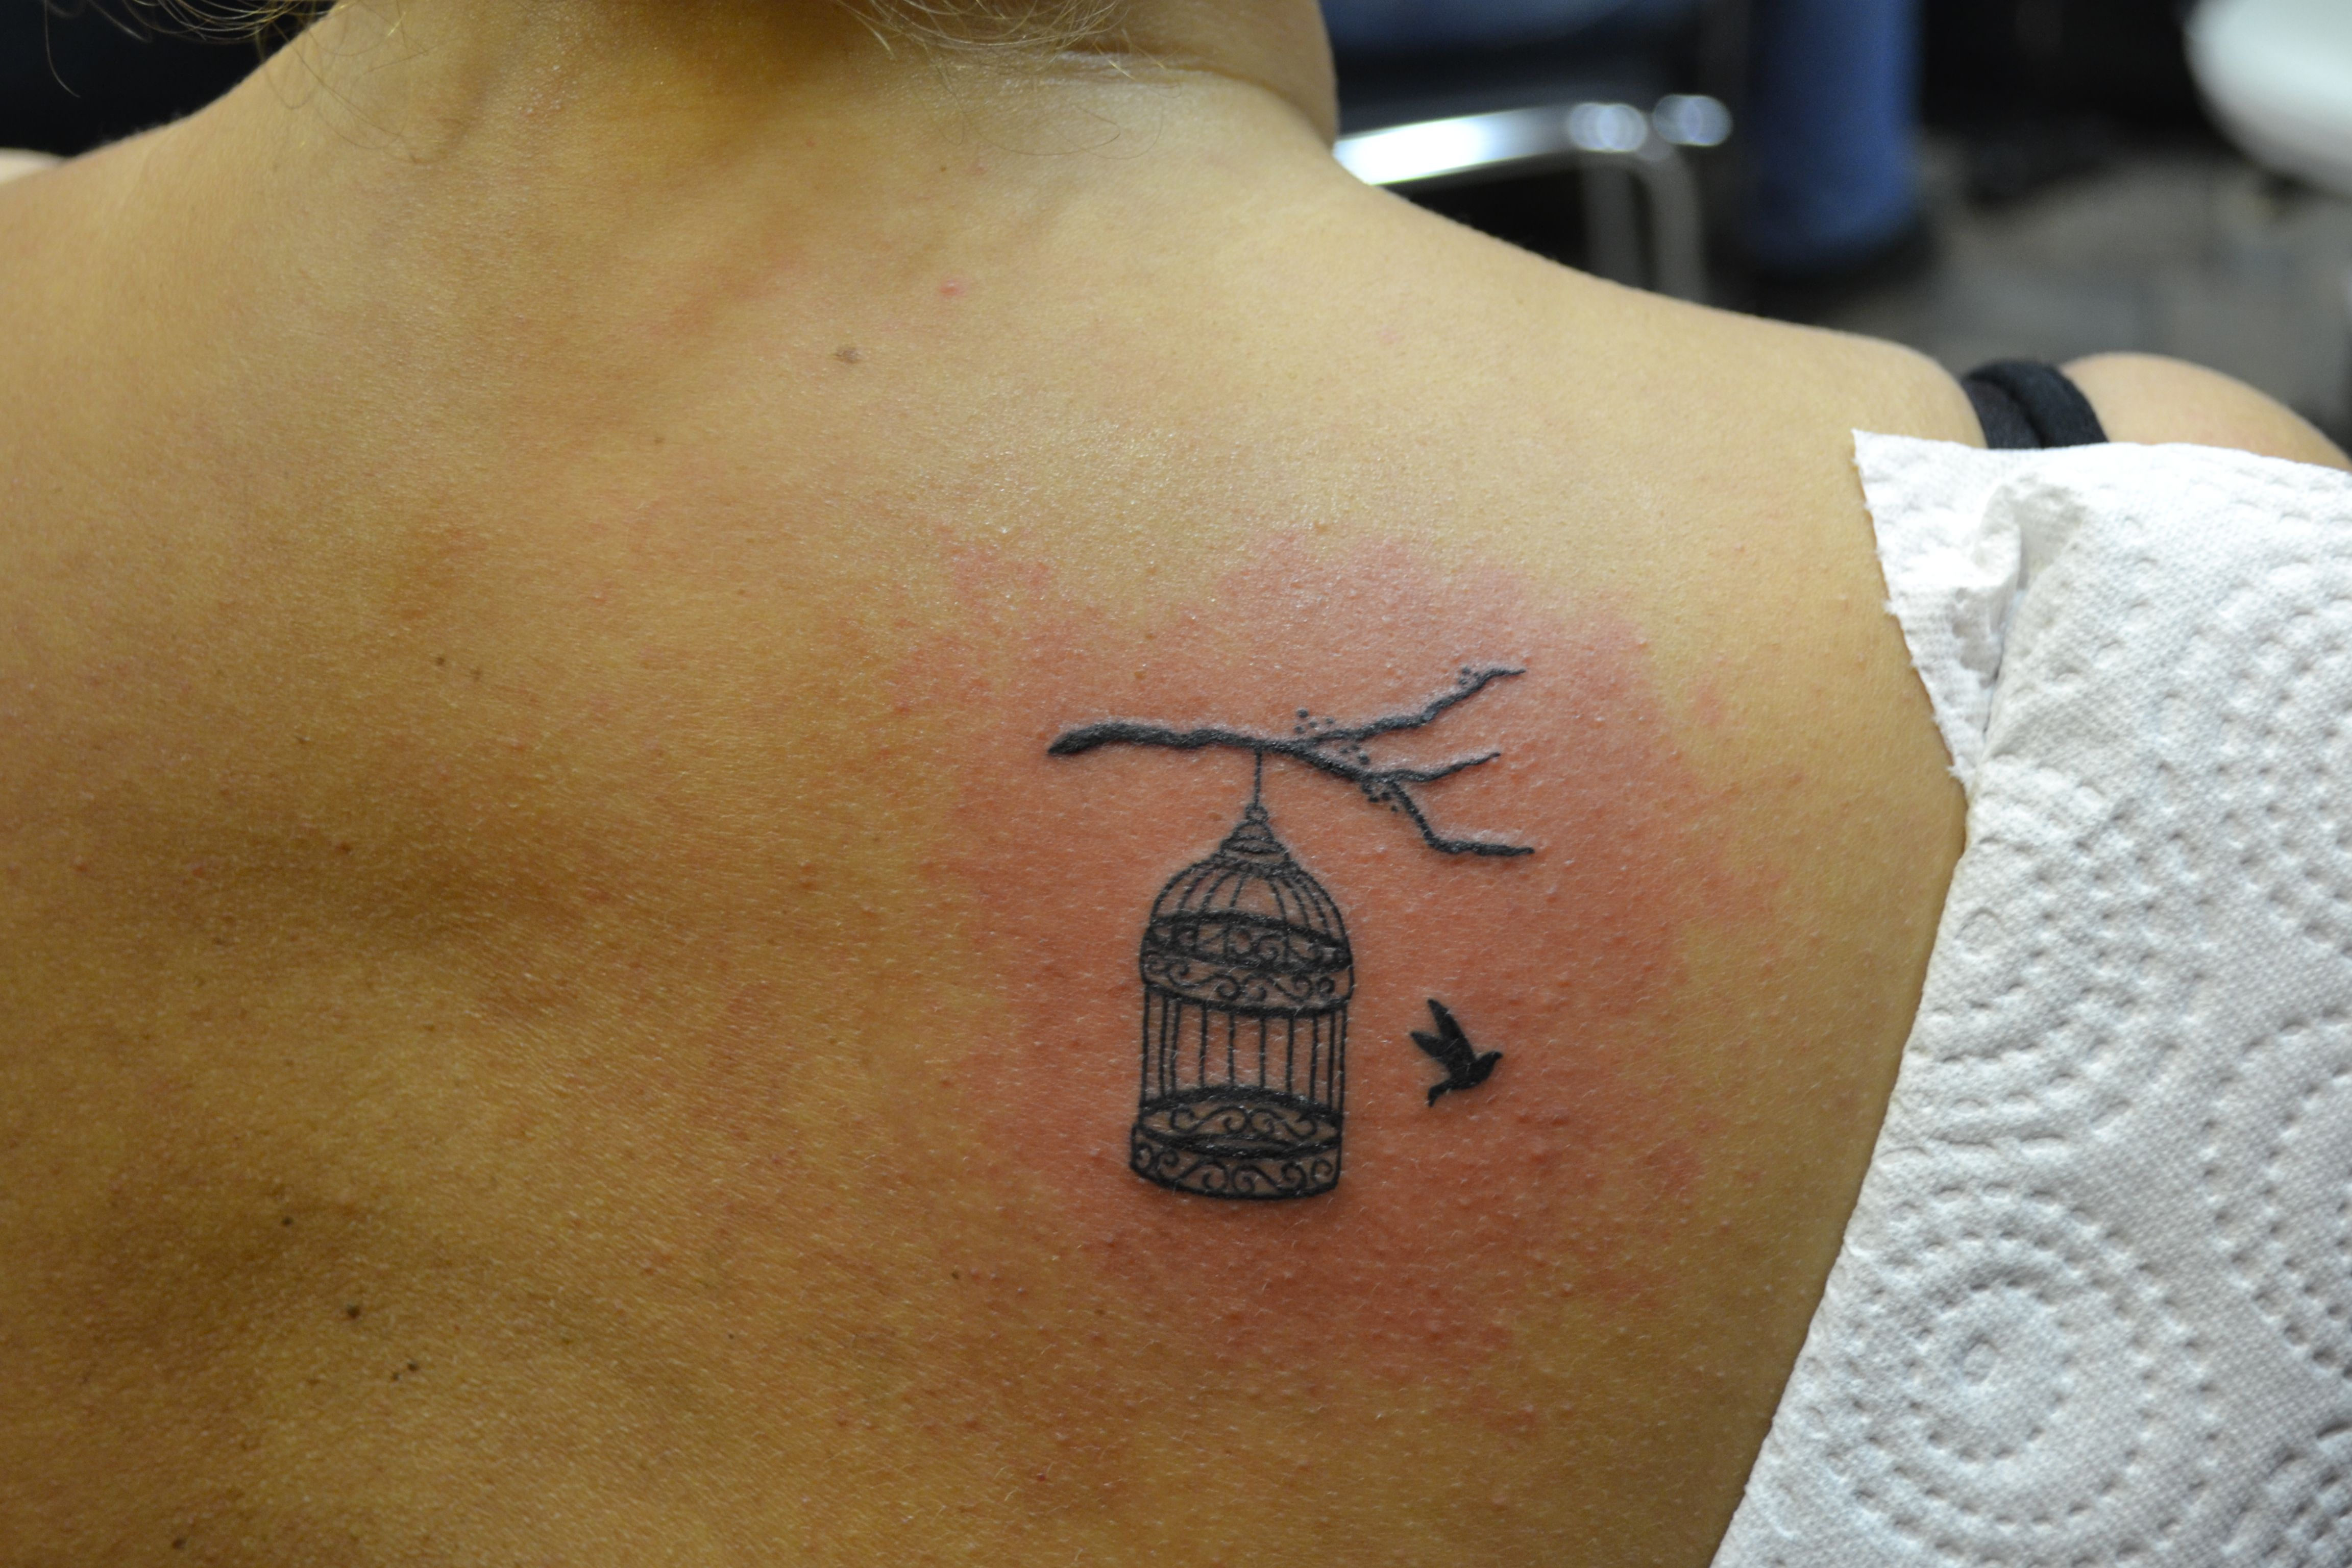 Westend Tattoo Westendtattooandpiercing Tattoo Small Tattoo Bird Tattoo Small Black Bird Tattoo Shoulder Ta Shoulder Tattoo Birdcage Tattoo Cage Tattoos